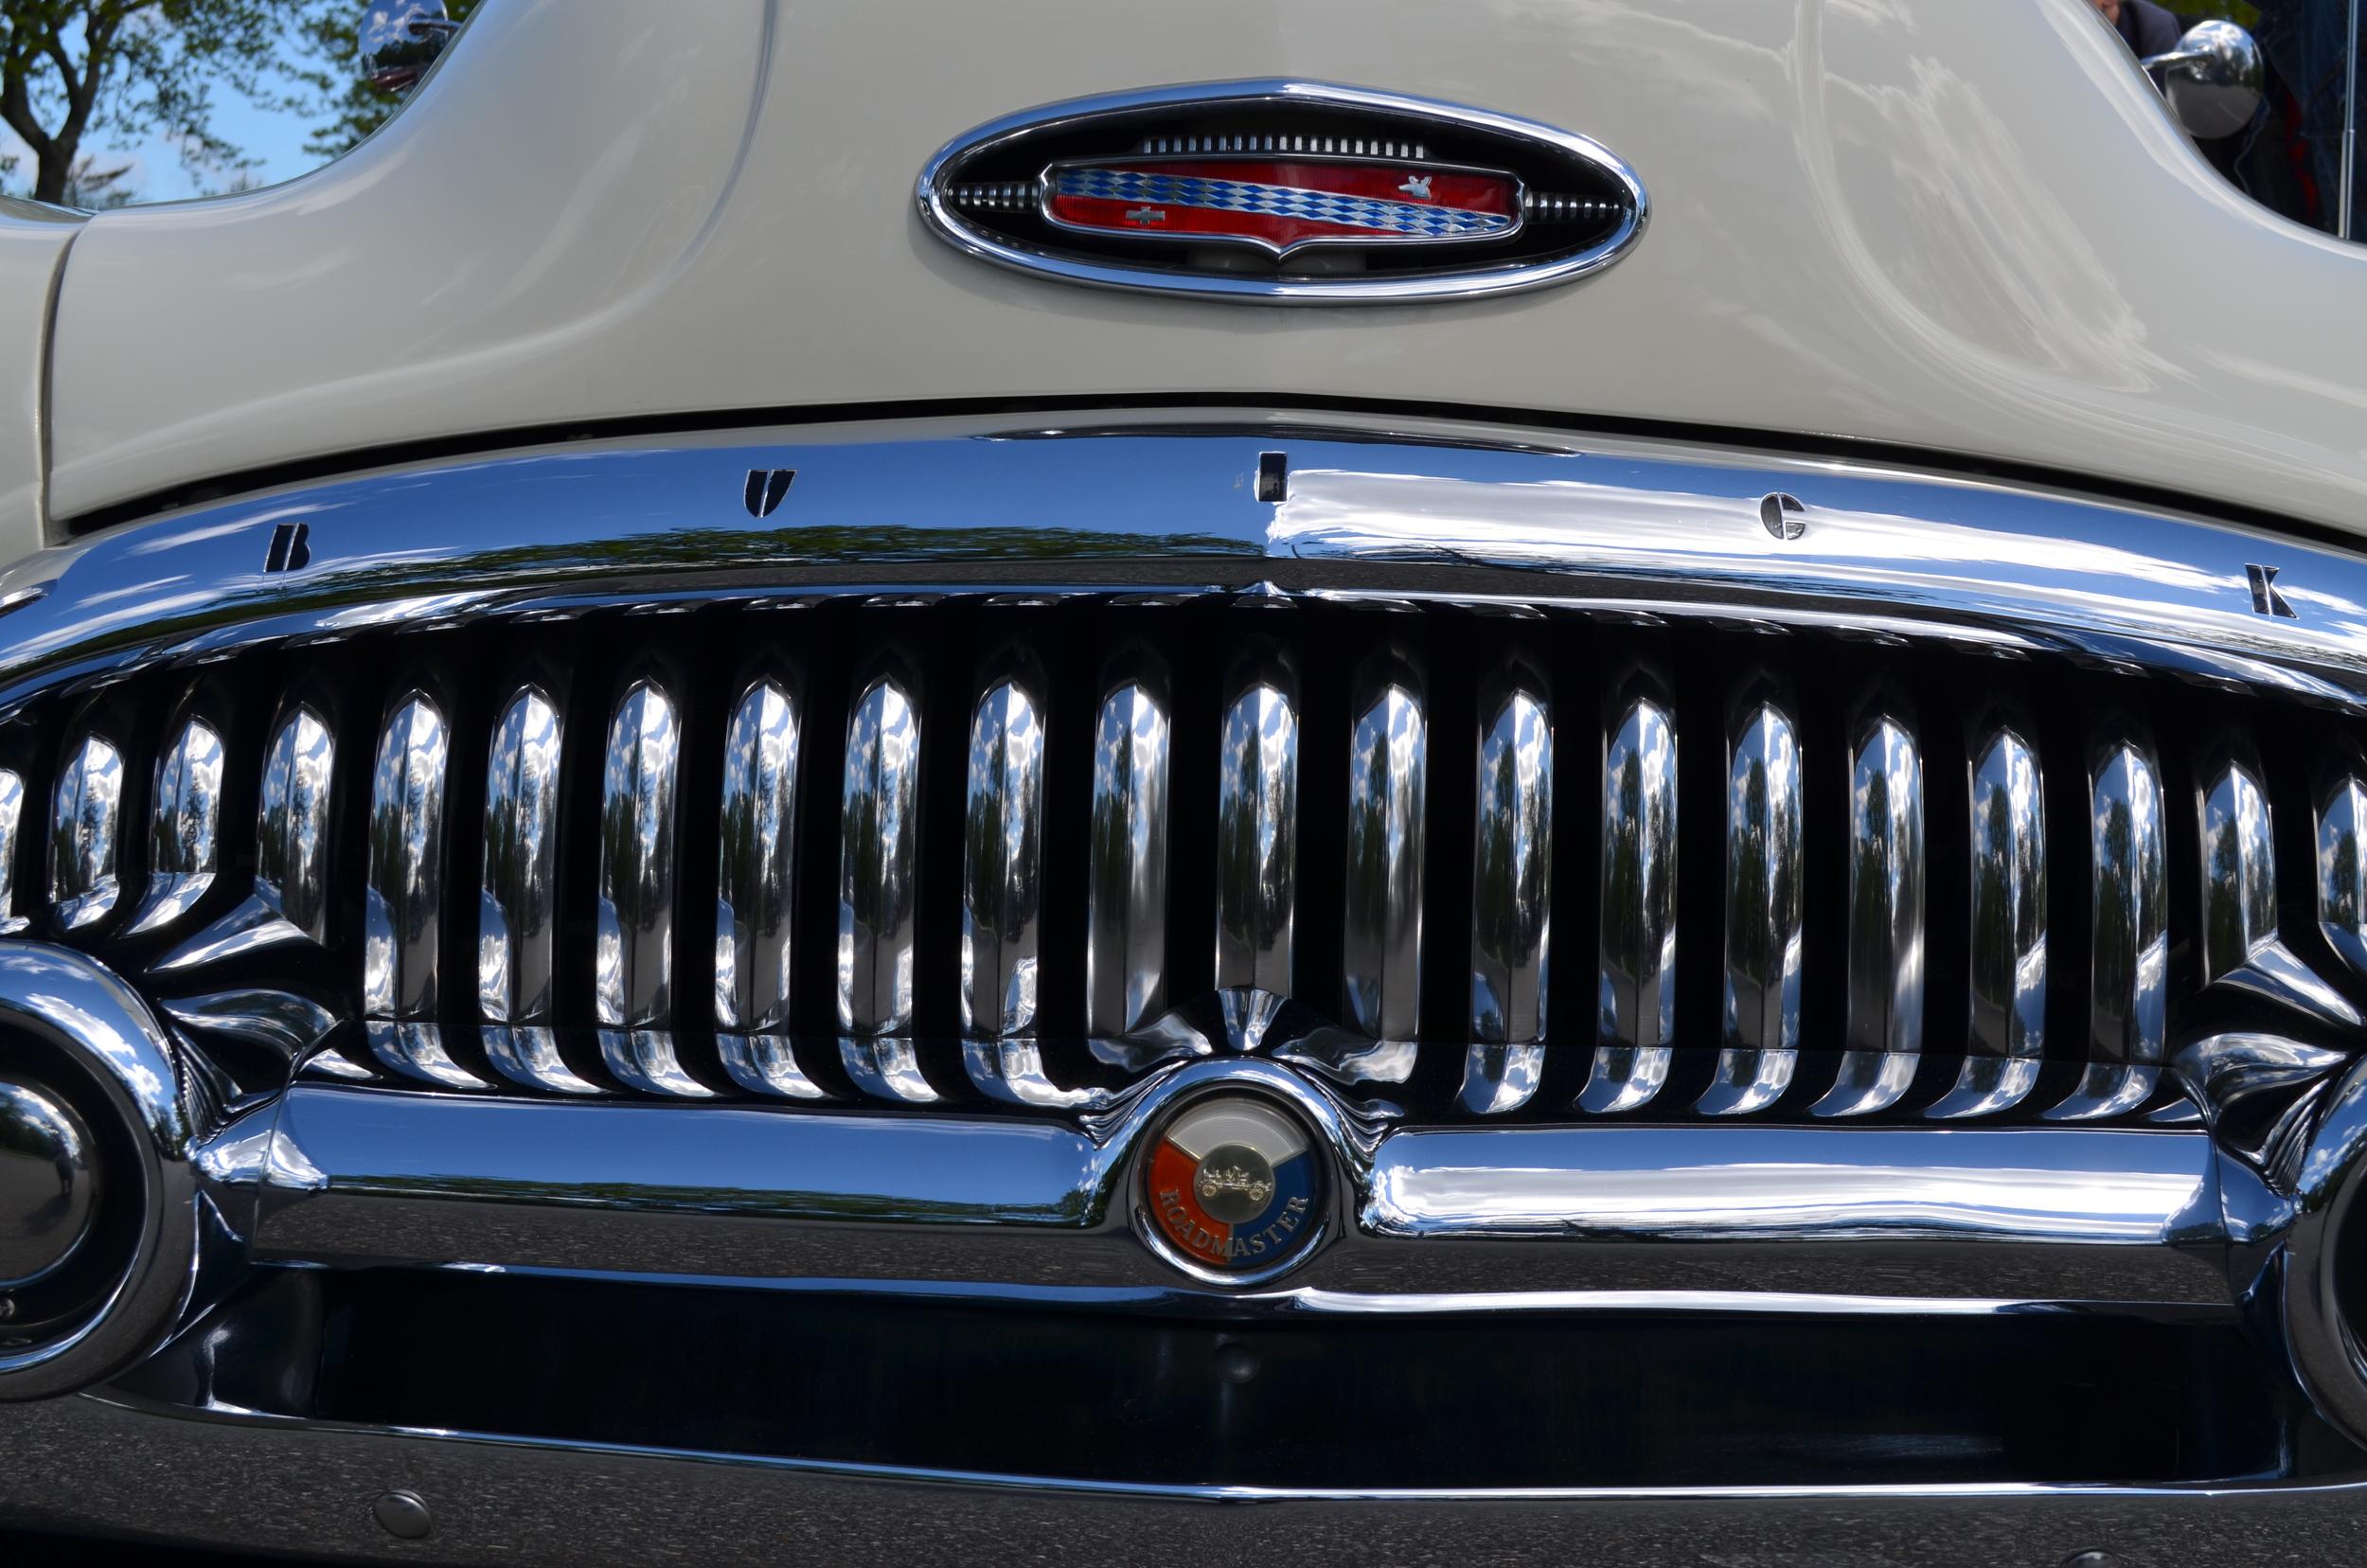 2013 Annual Car Show, Marjorie Post Park, Massapequa